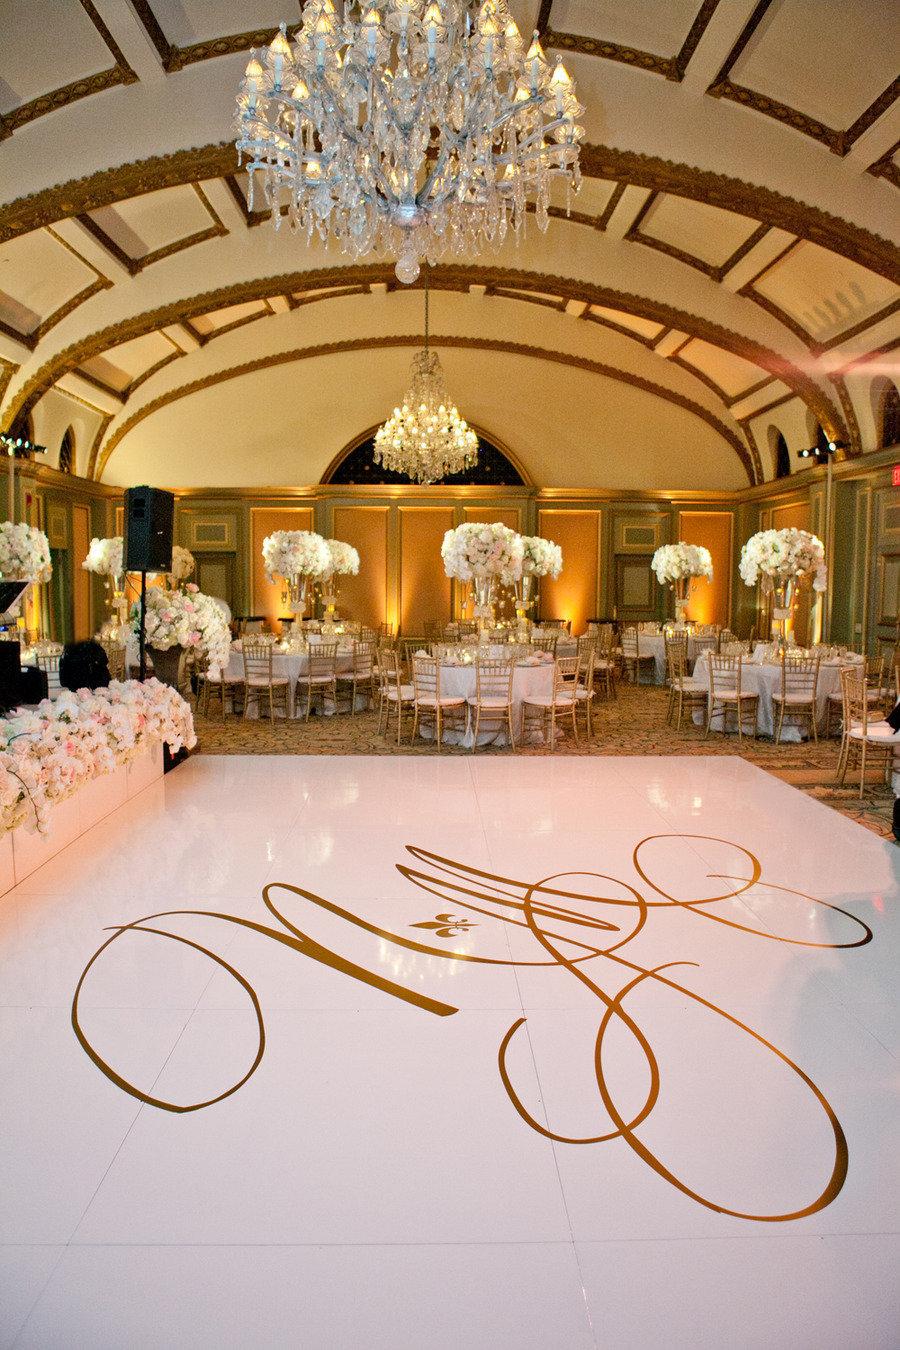 Wedding-monogram-displayed-on-dance-floor.full